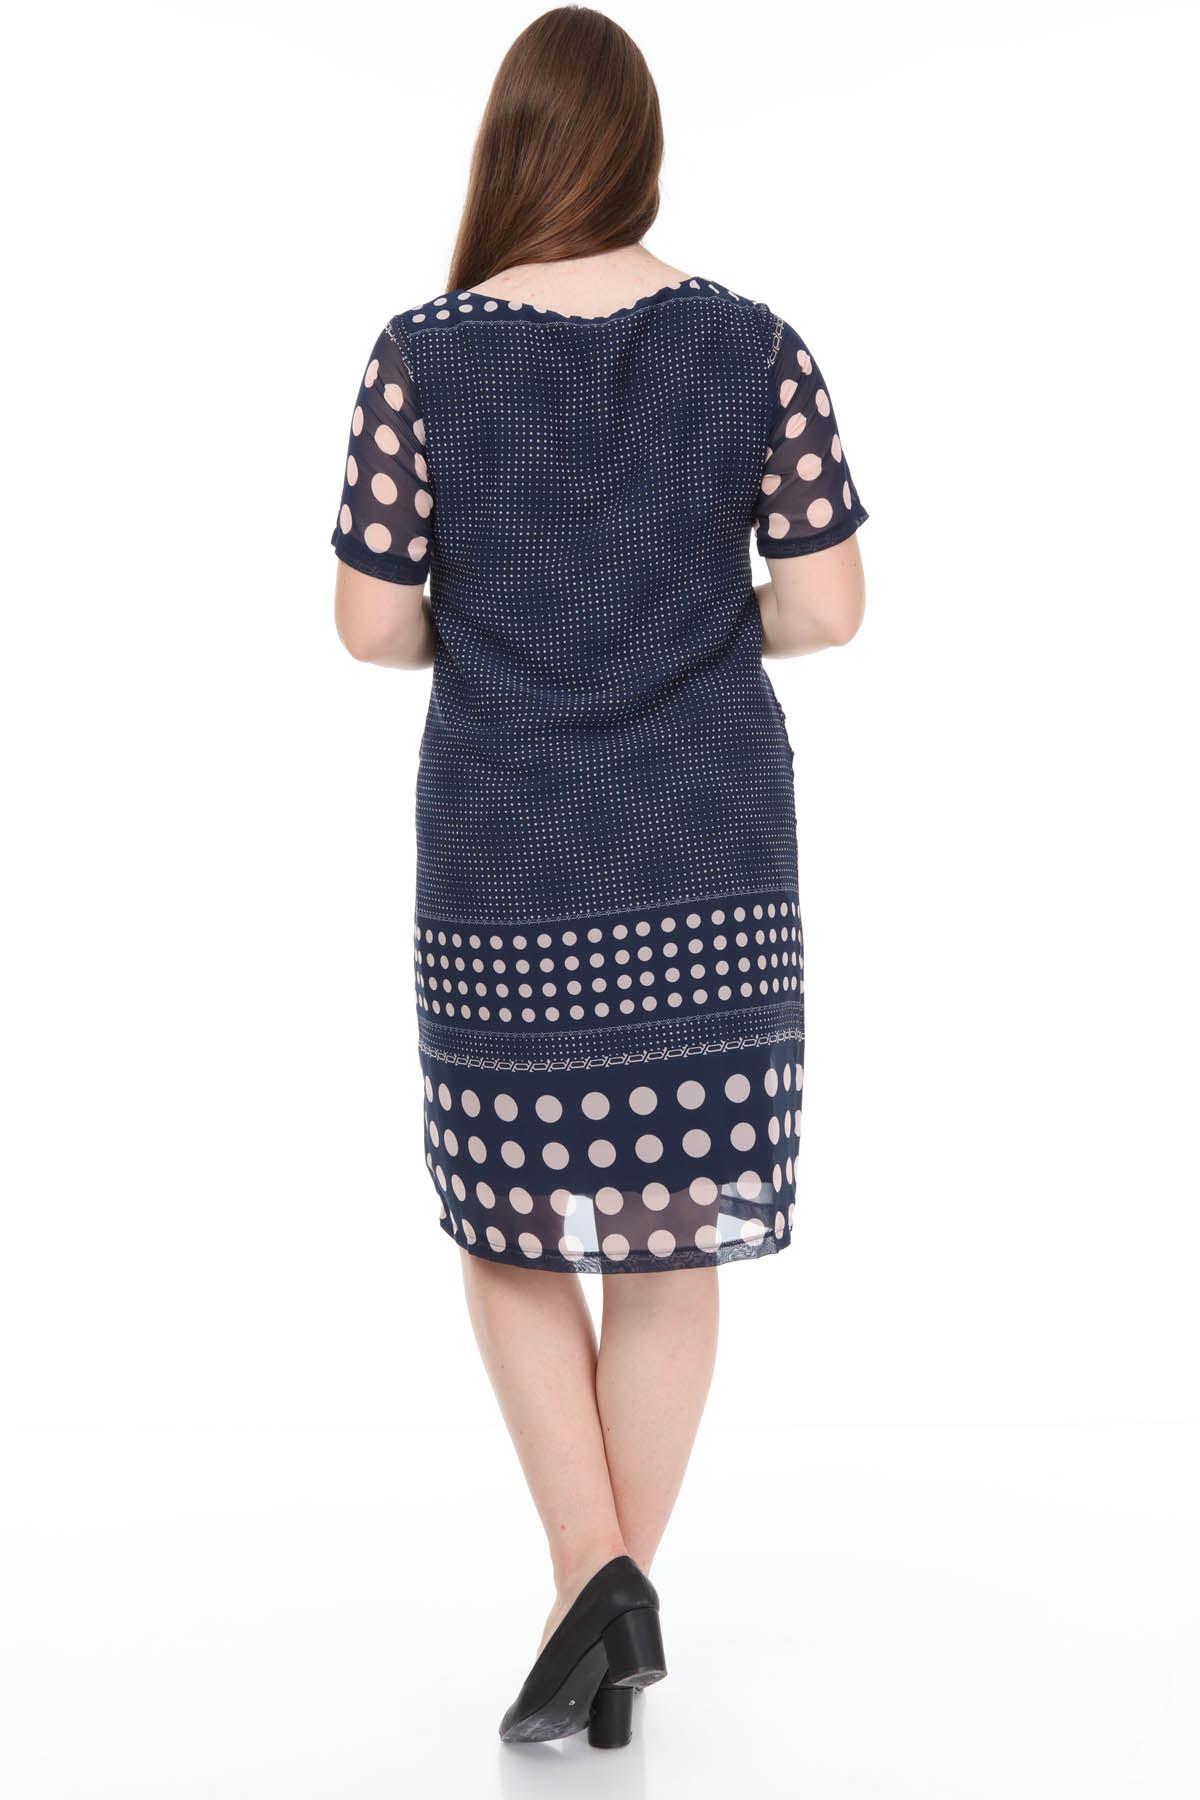 Lacivert Şifon Elbise F3-1128